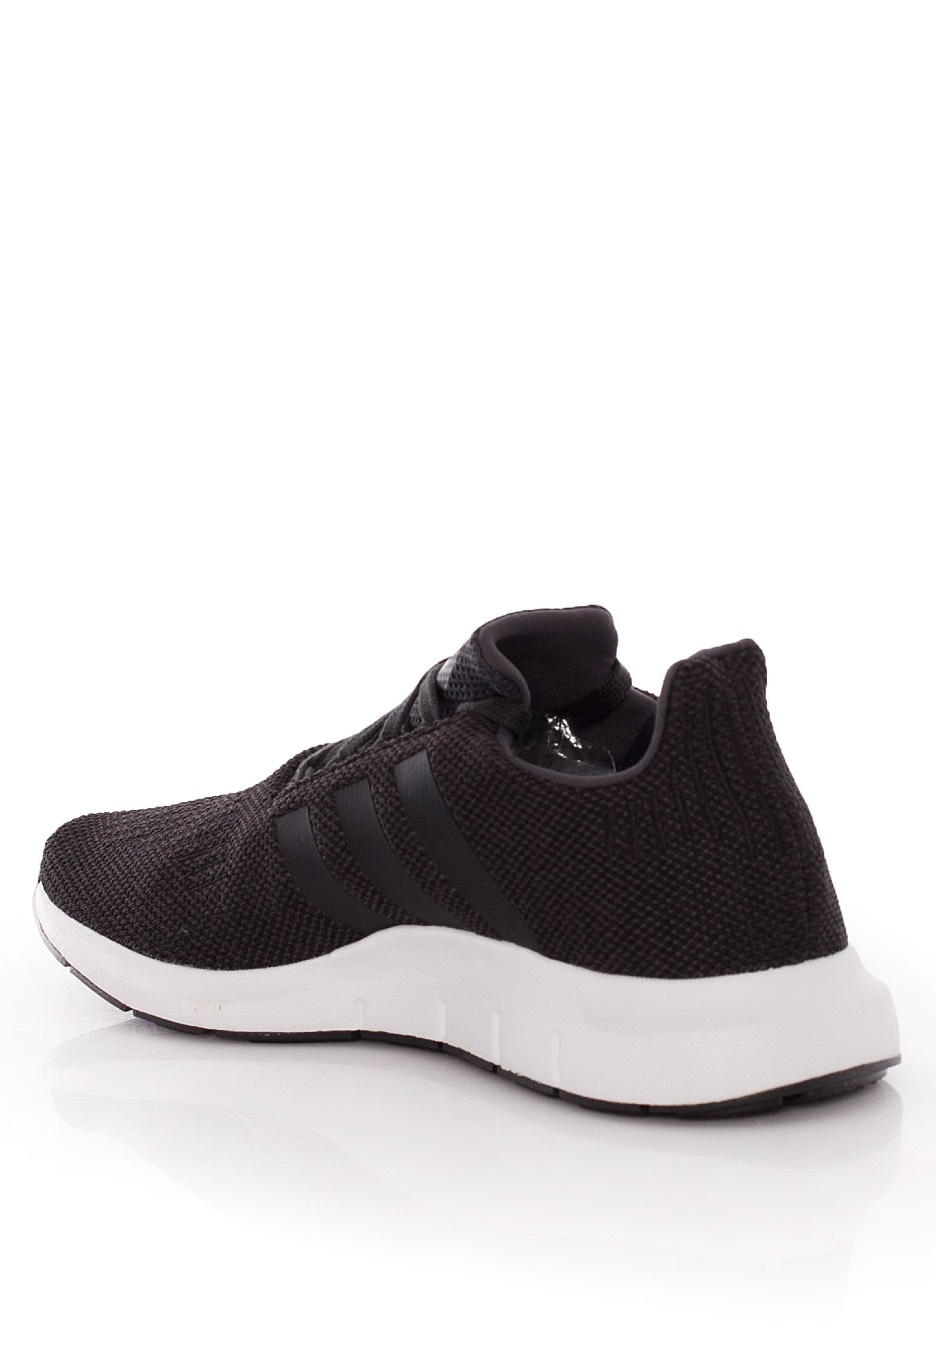 Carboncore Shoes Grey Heather Swift Adidas Blackmedium Run RxqEvTwAP